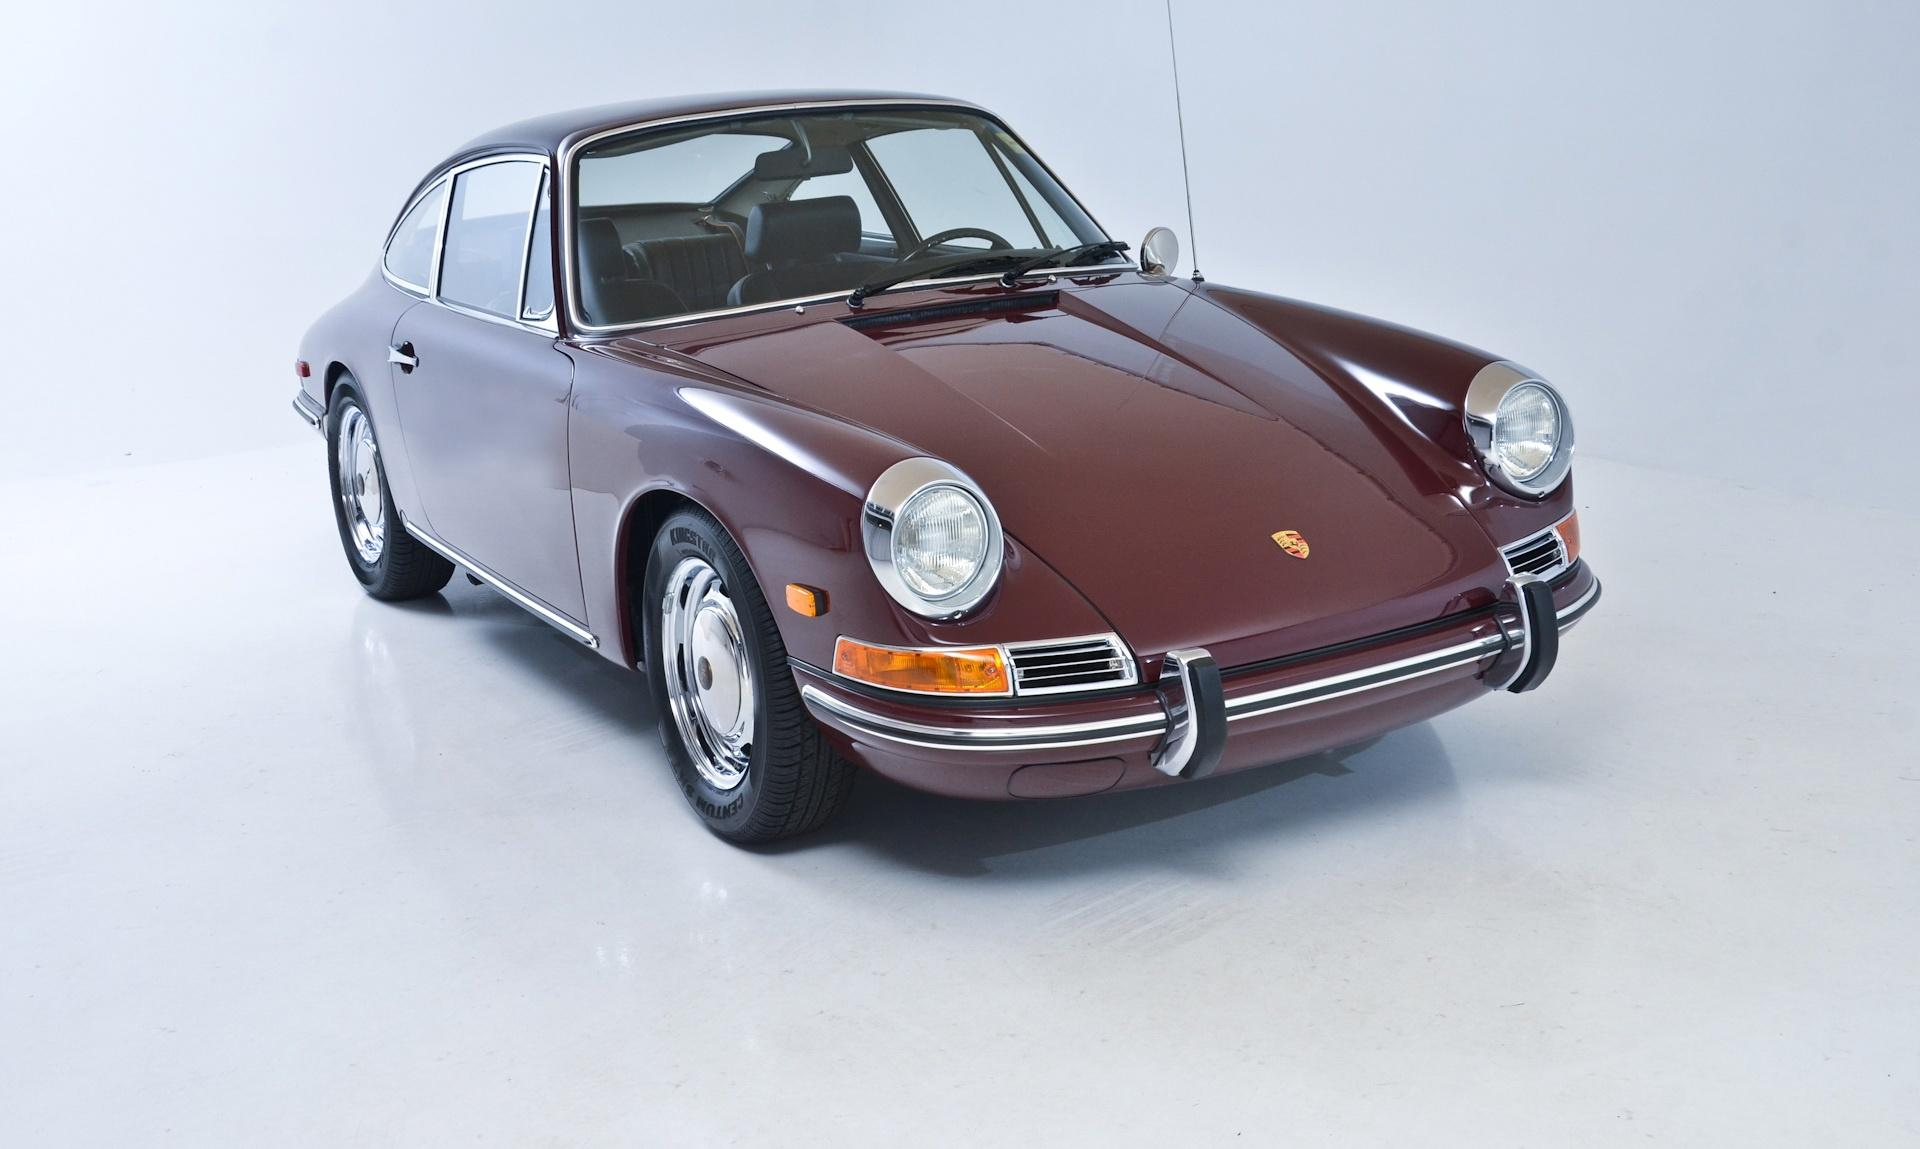 1968 Porsche 912 Exotic Classic Car Dealership New York